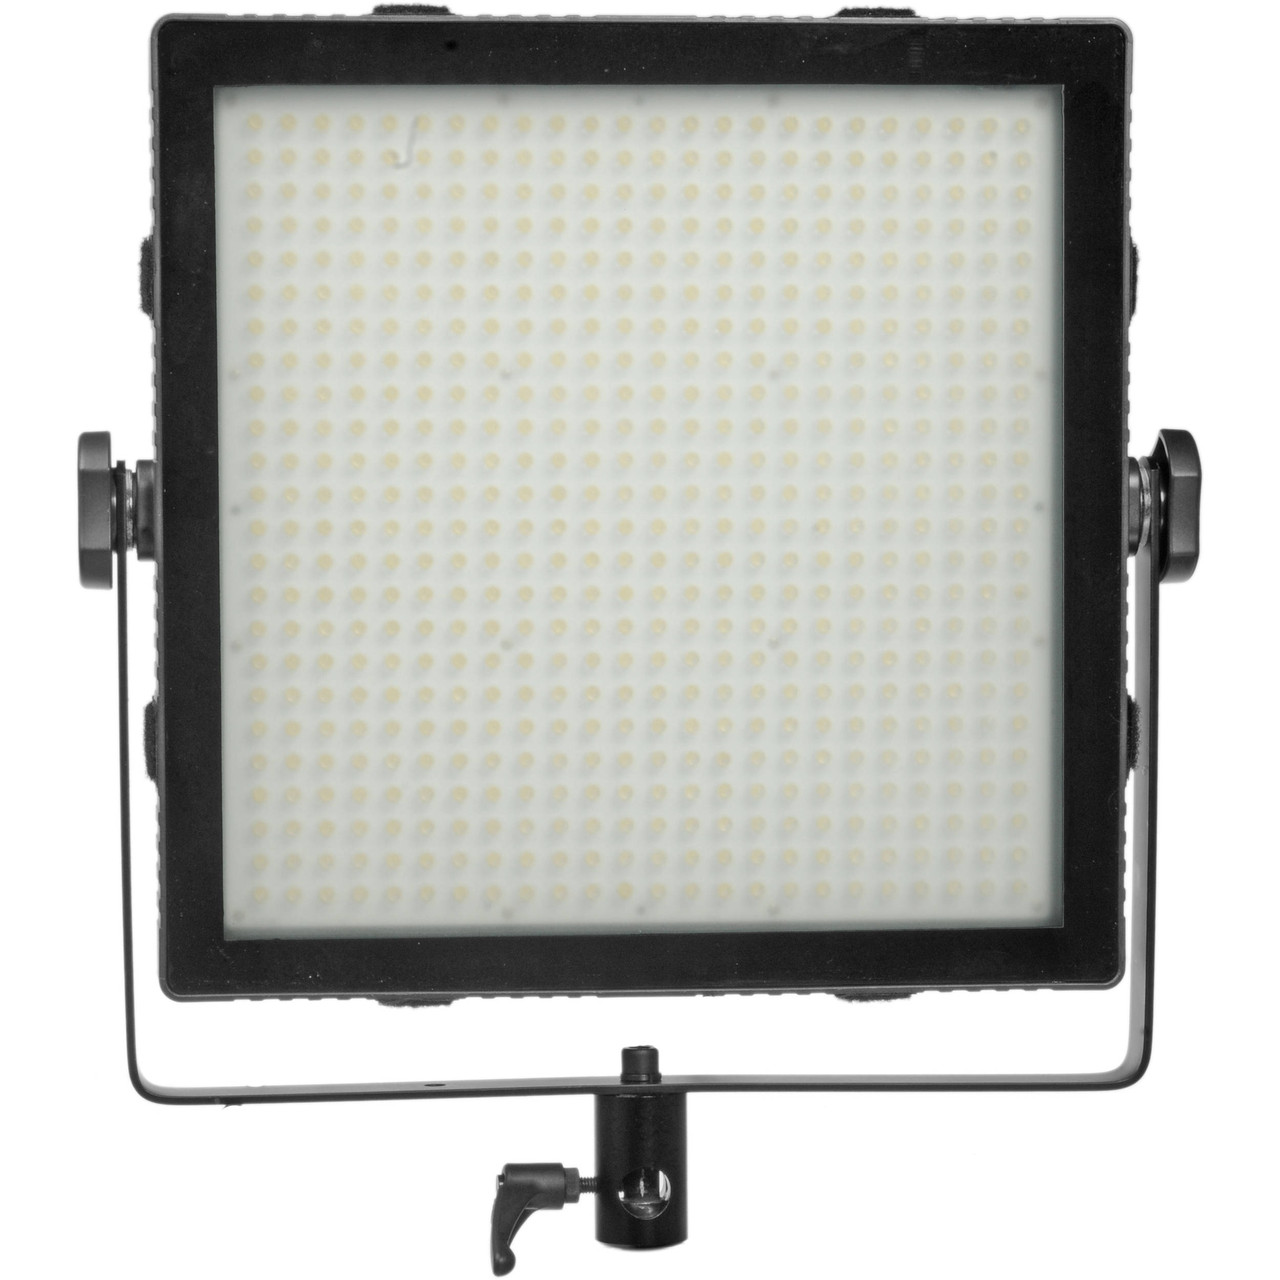 Dedolight Felloni Tecpro 15 Degree High Output Tungsten LED Light (TP-LONI-T15HO)